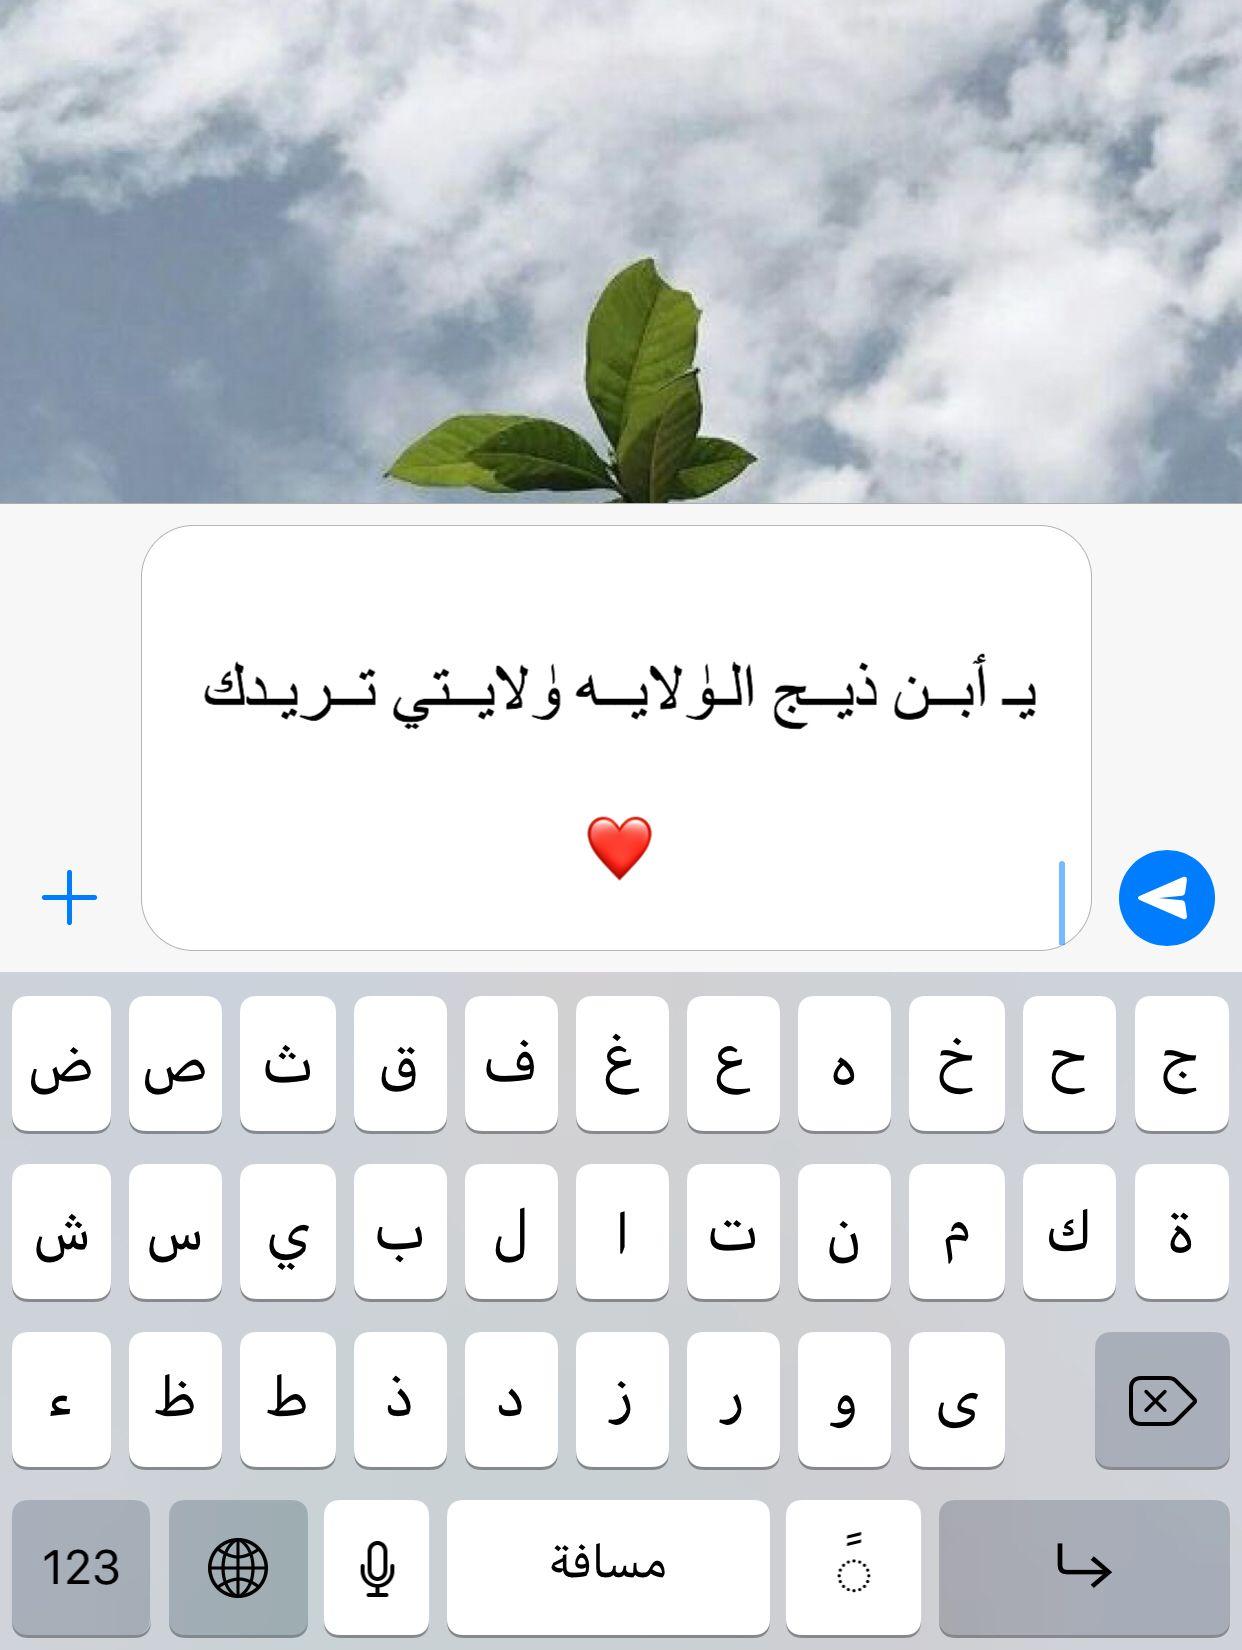 أي ـ Yesـ ہ وعلي Movie Quotes Funny Beautiful Arabic Words Arabic Love Quotes